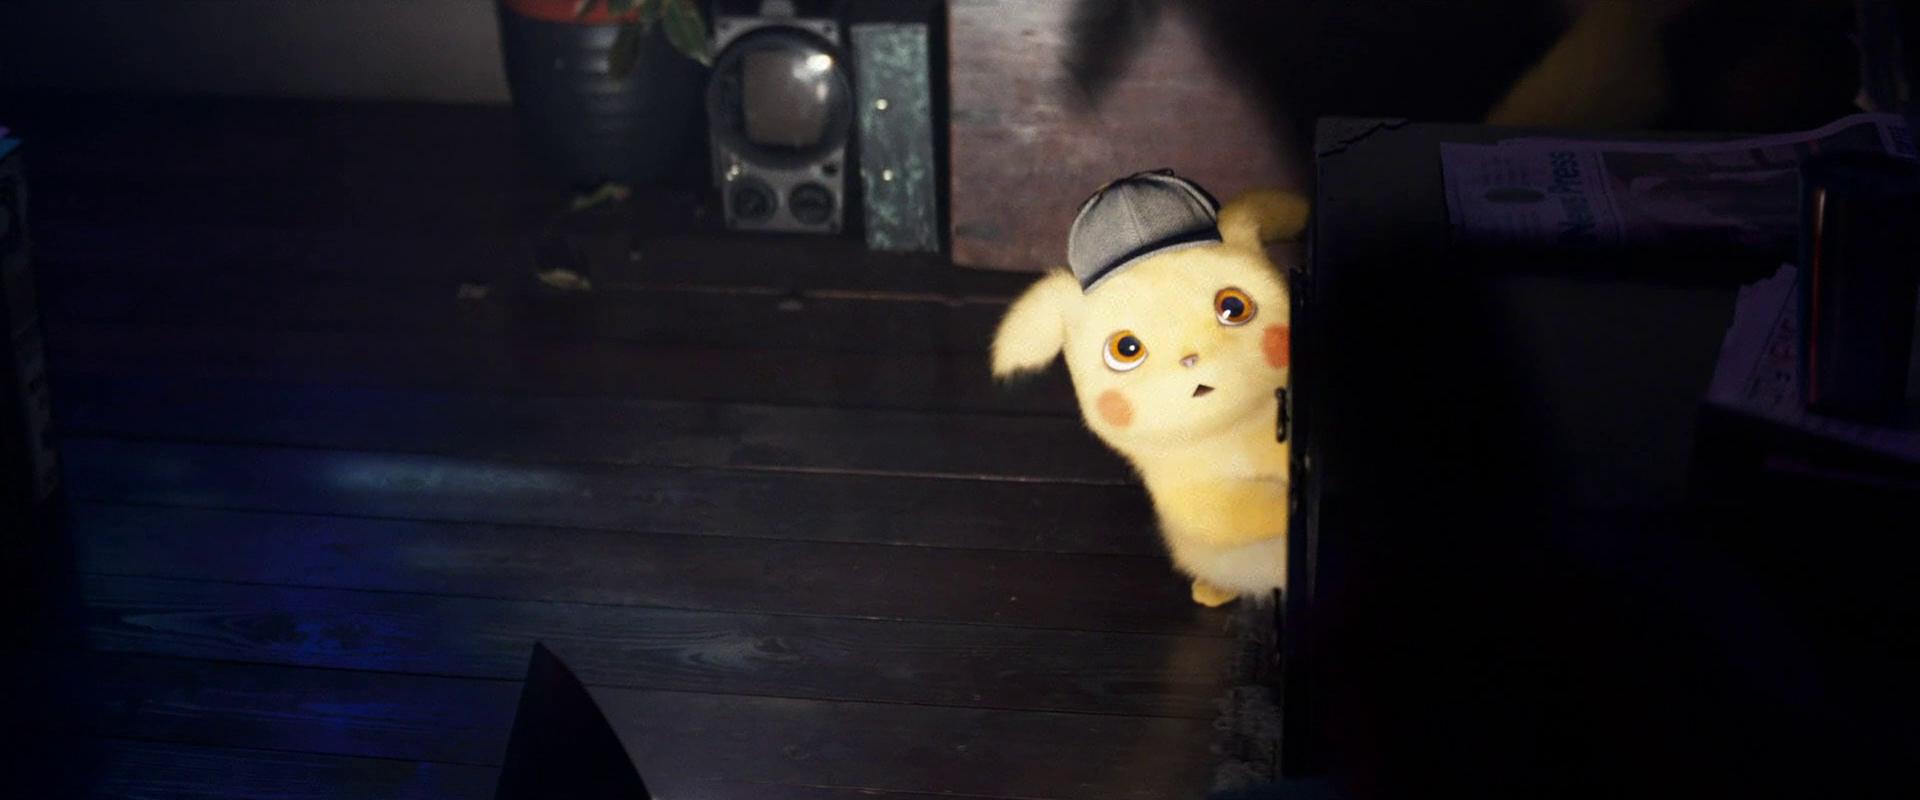 Pokemon Detective Pikachu 2019 1080p HDRip X264-EVO